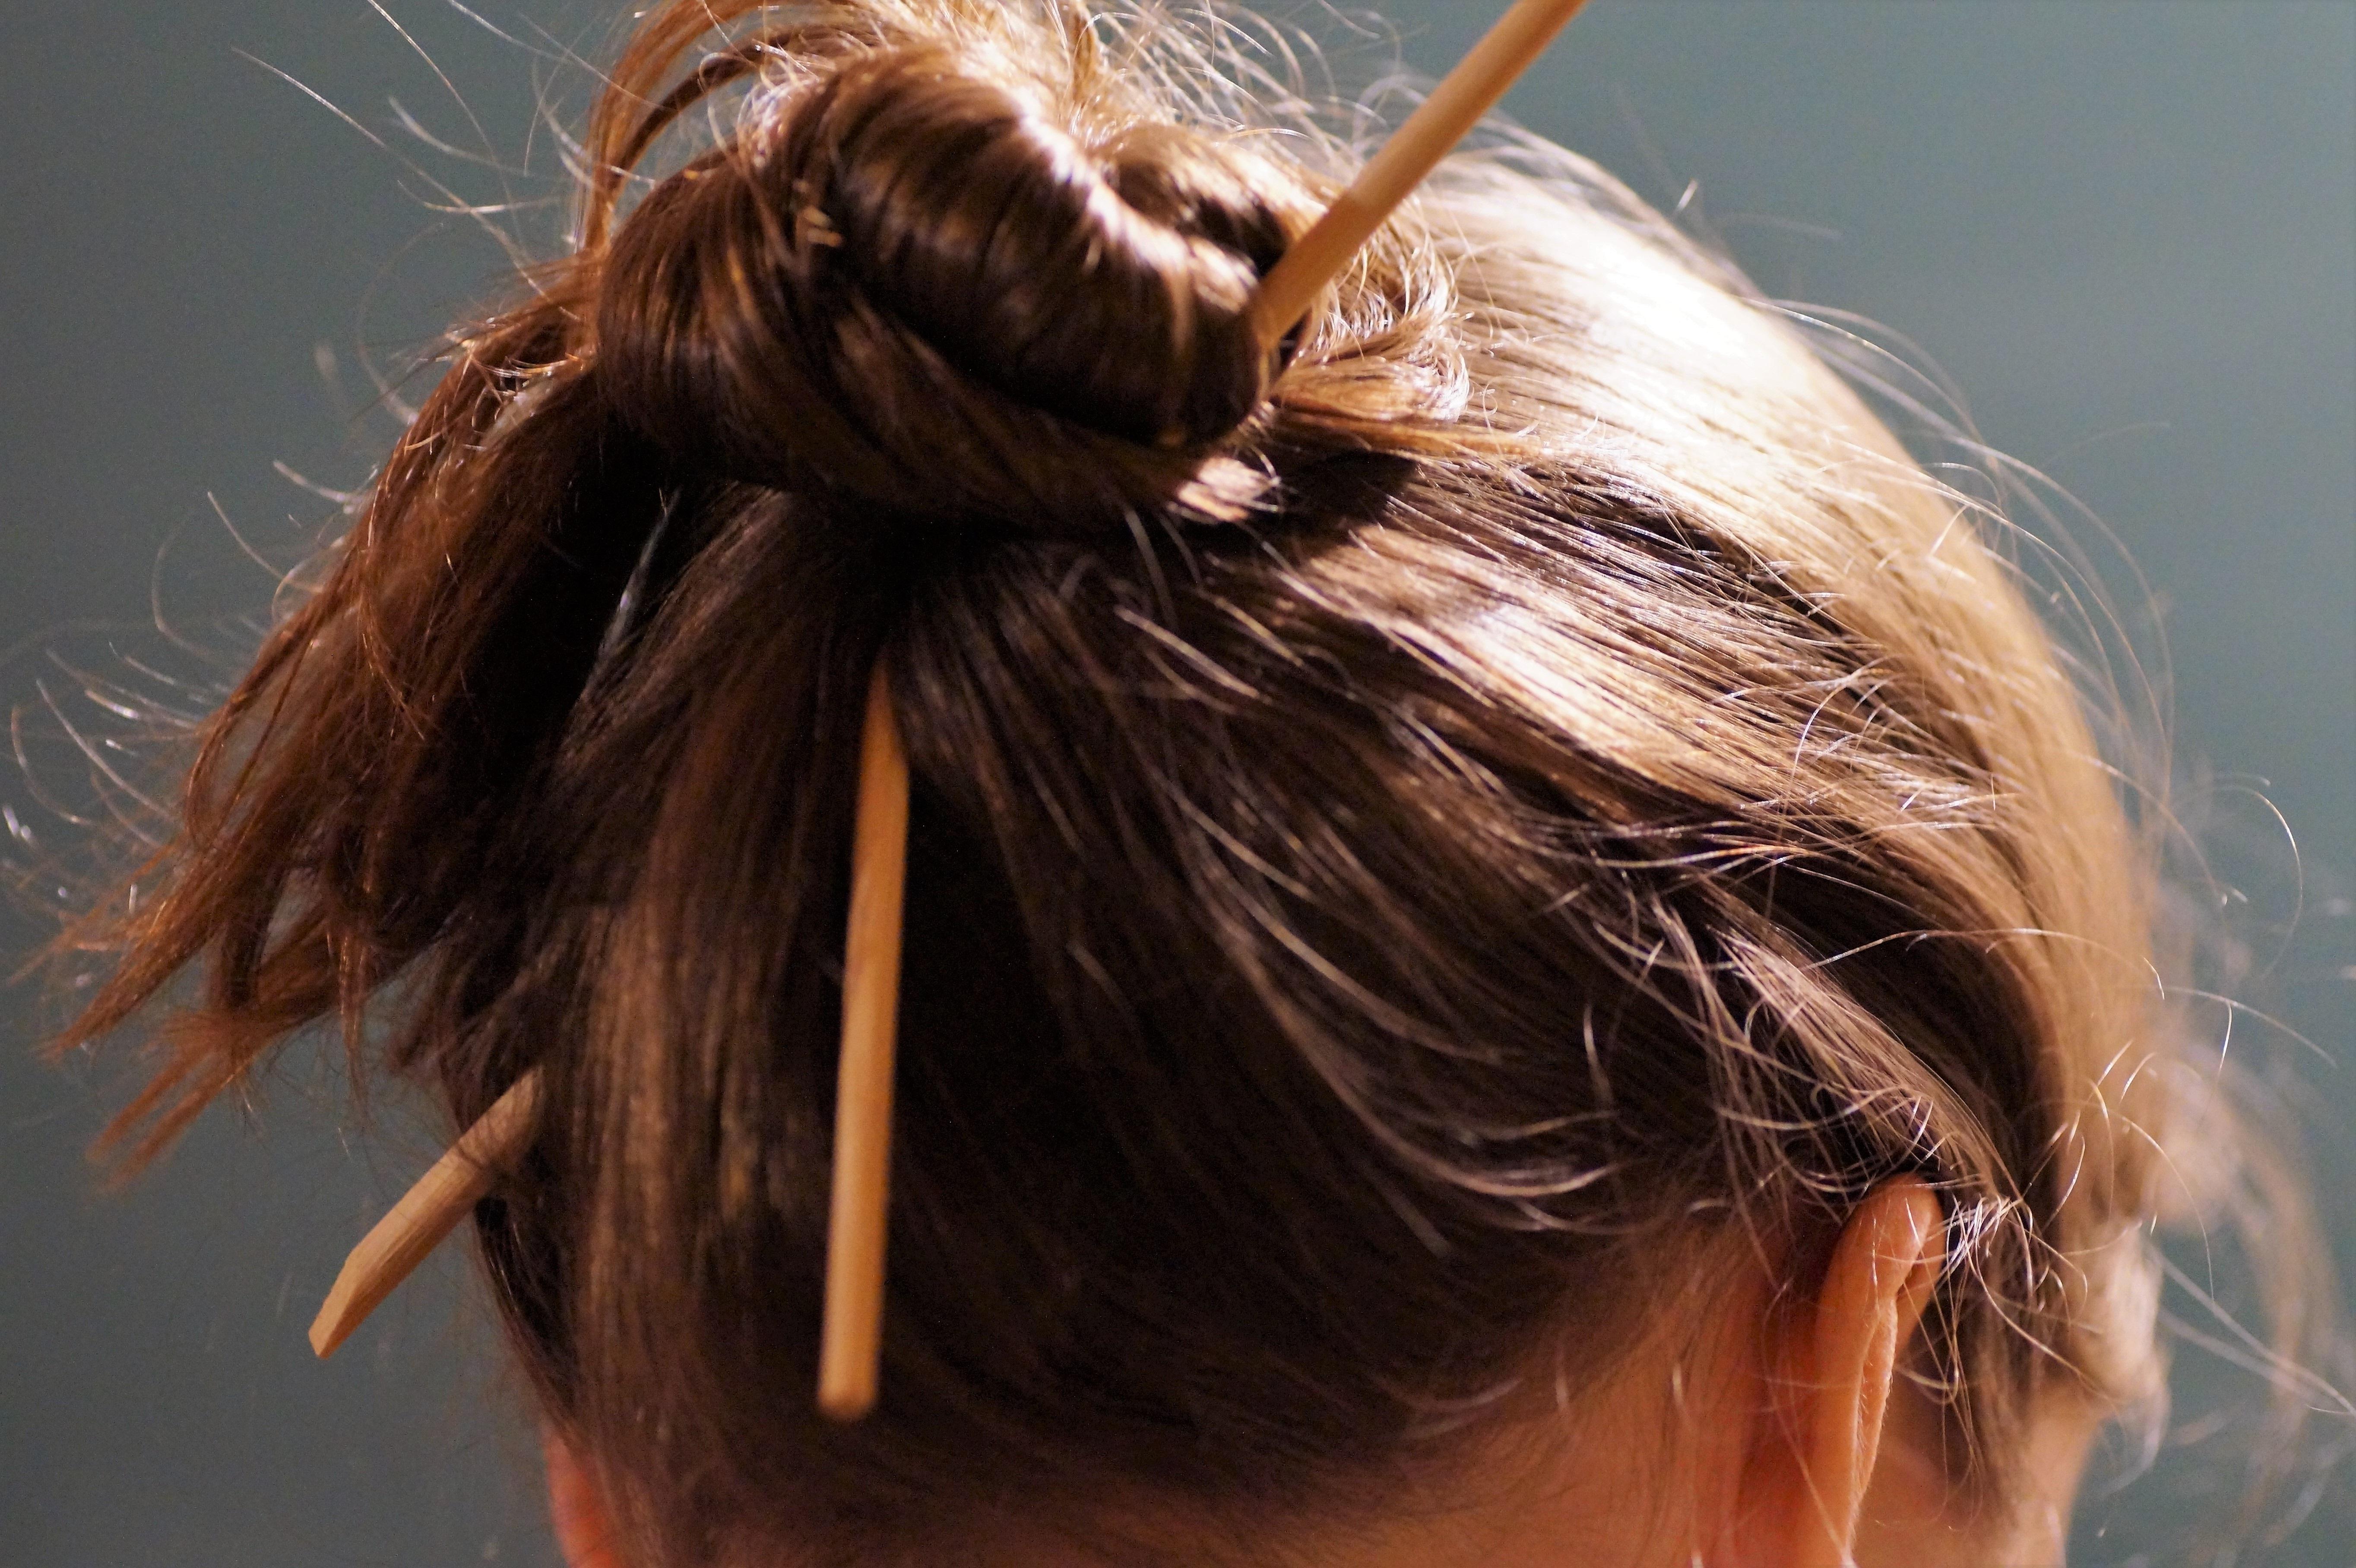 Girl Hair Brunette Young Brown Mane Ear Hairstyle Long Hair Chopstick Bun  Head Closed Node Brown